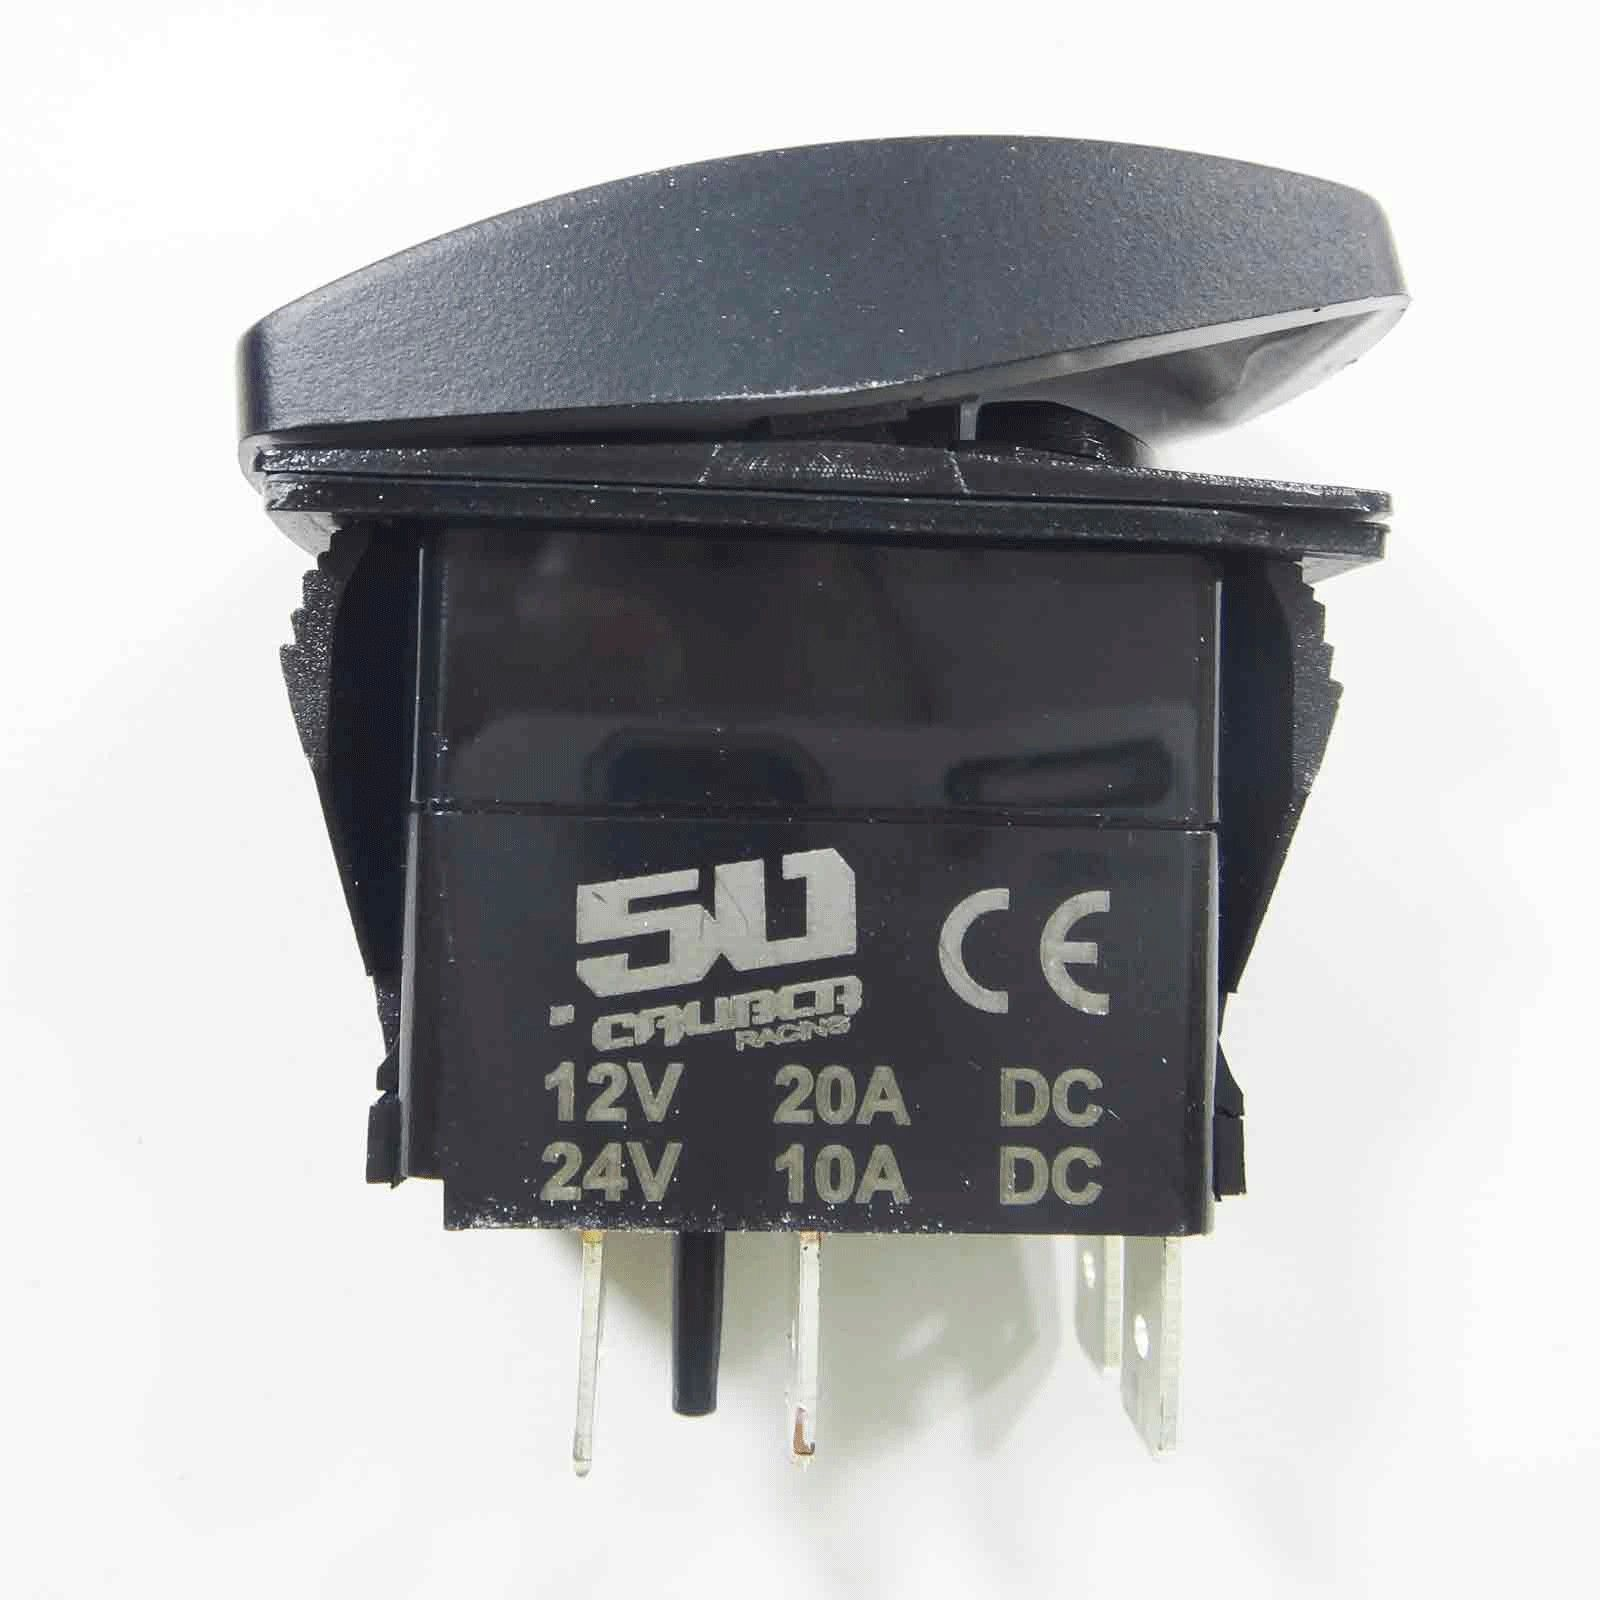 Led Rocker Switch Zombie Lights Switch Rocker Switches Switches